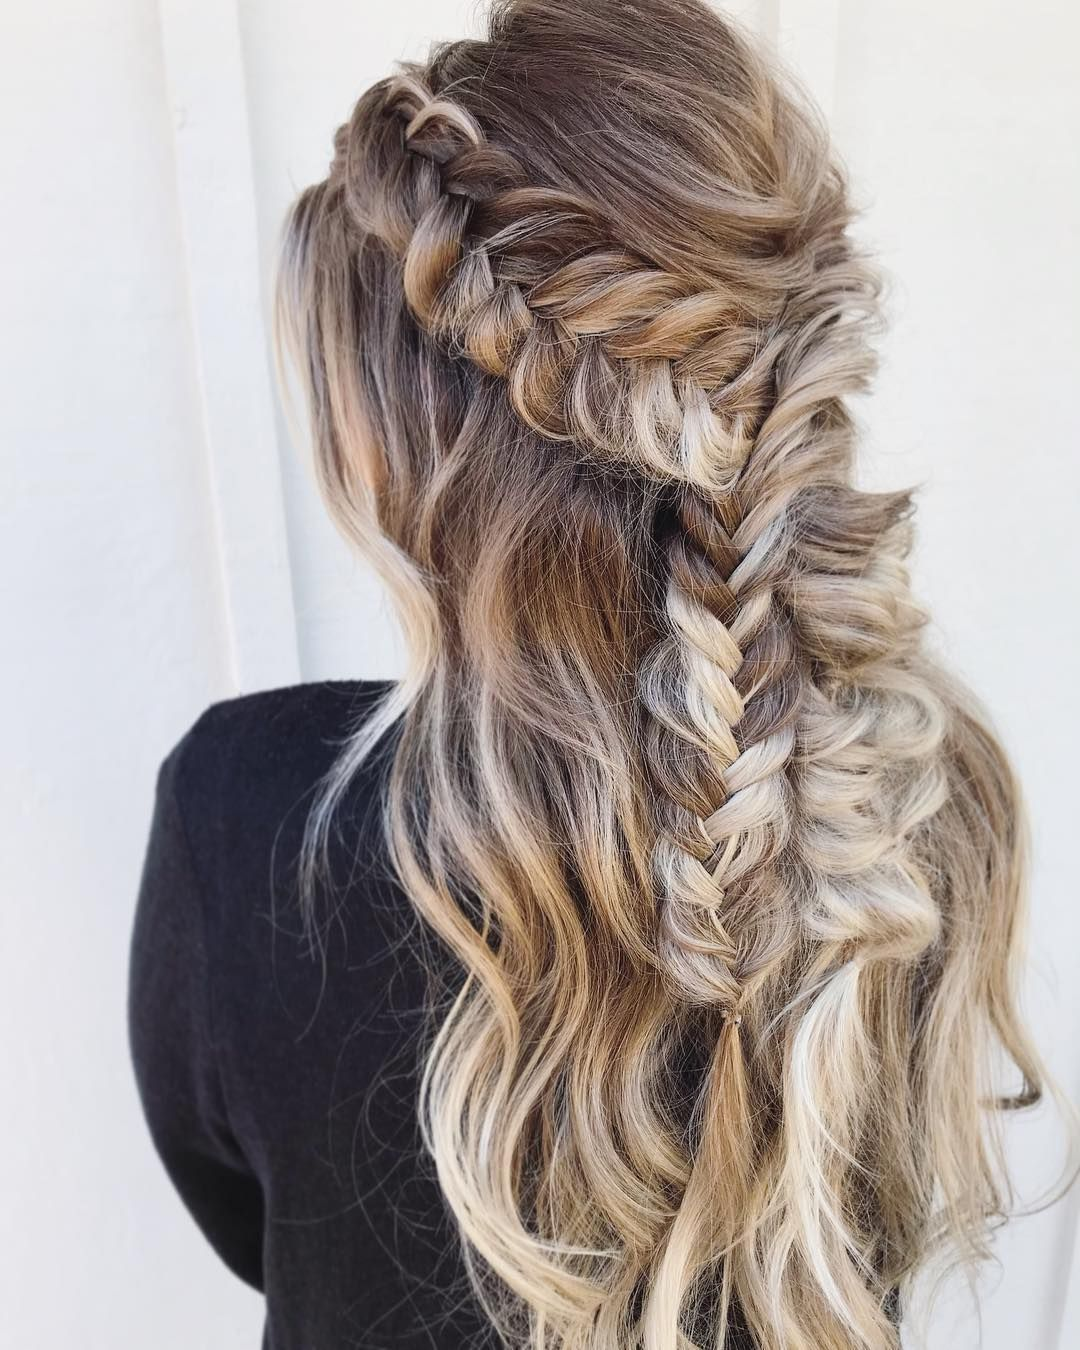 Beautiful Braided Half Up Half Down Hairstyle